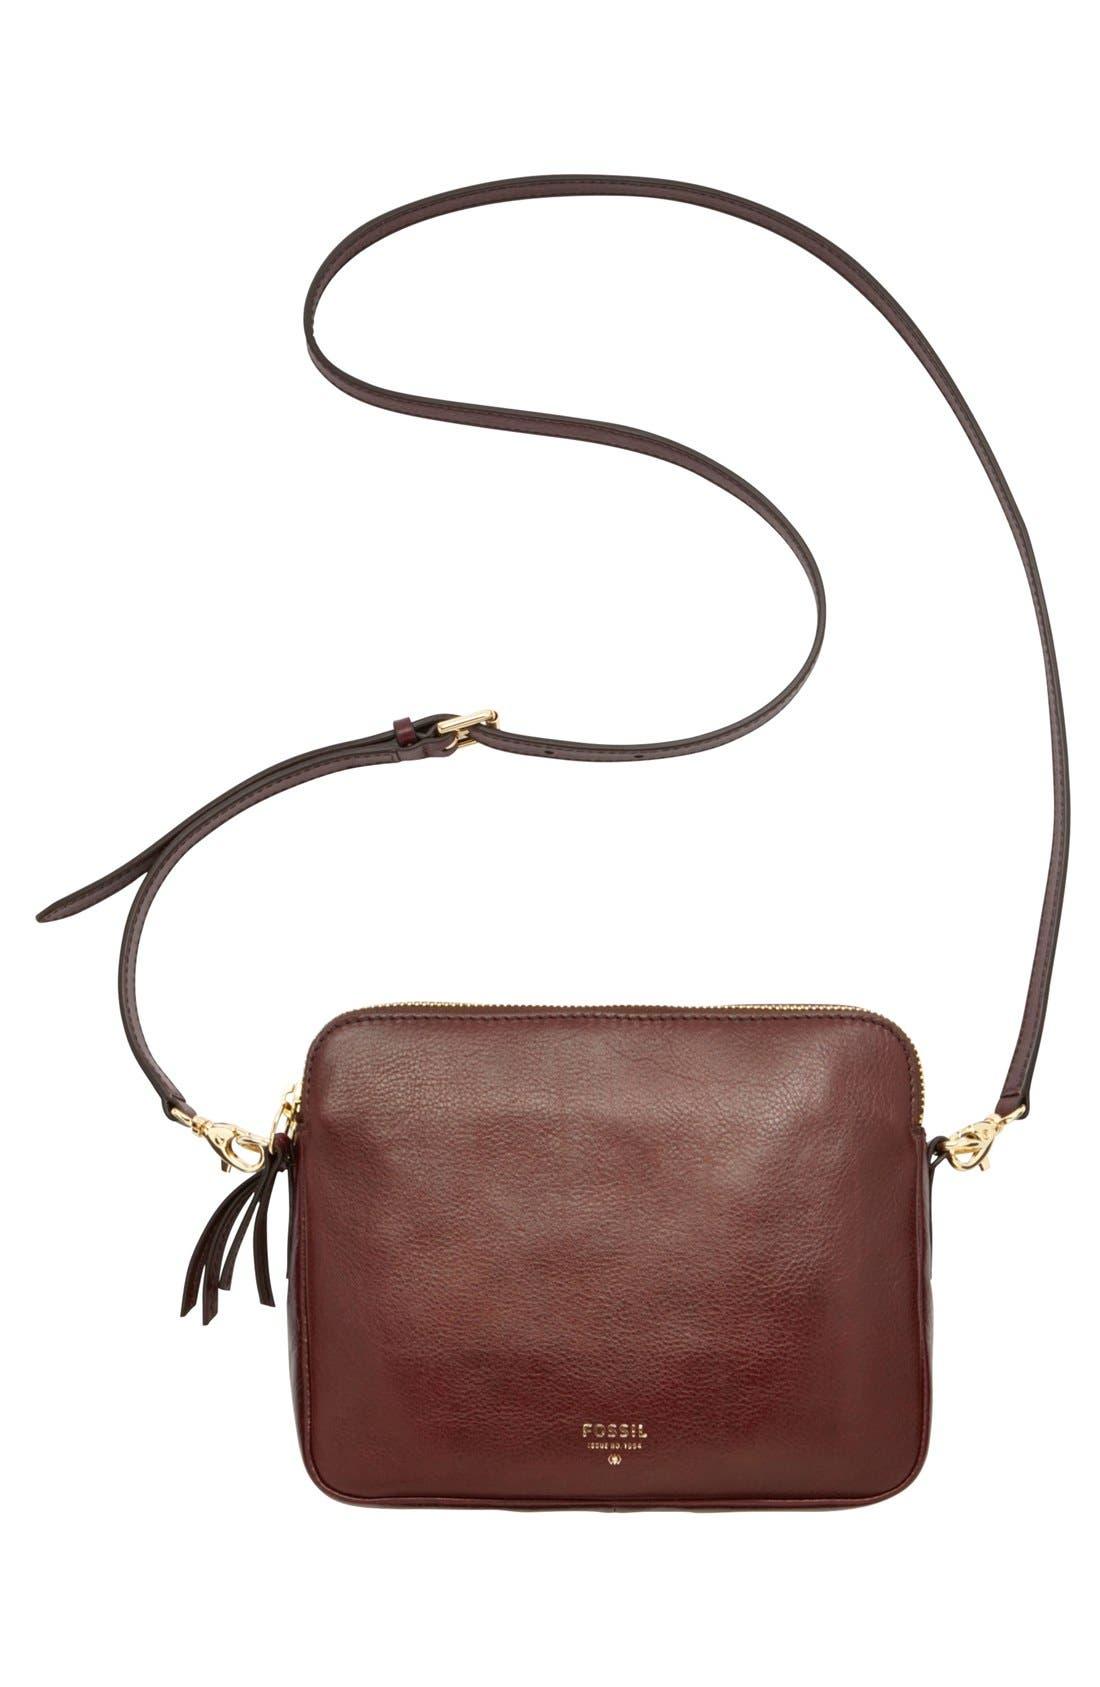 Alternate Image 2  - Fossil 'Sydney' Leather Crossbody Bag